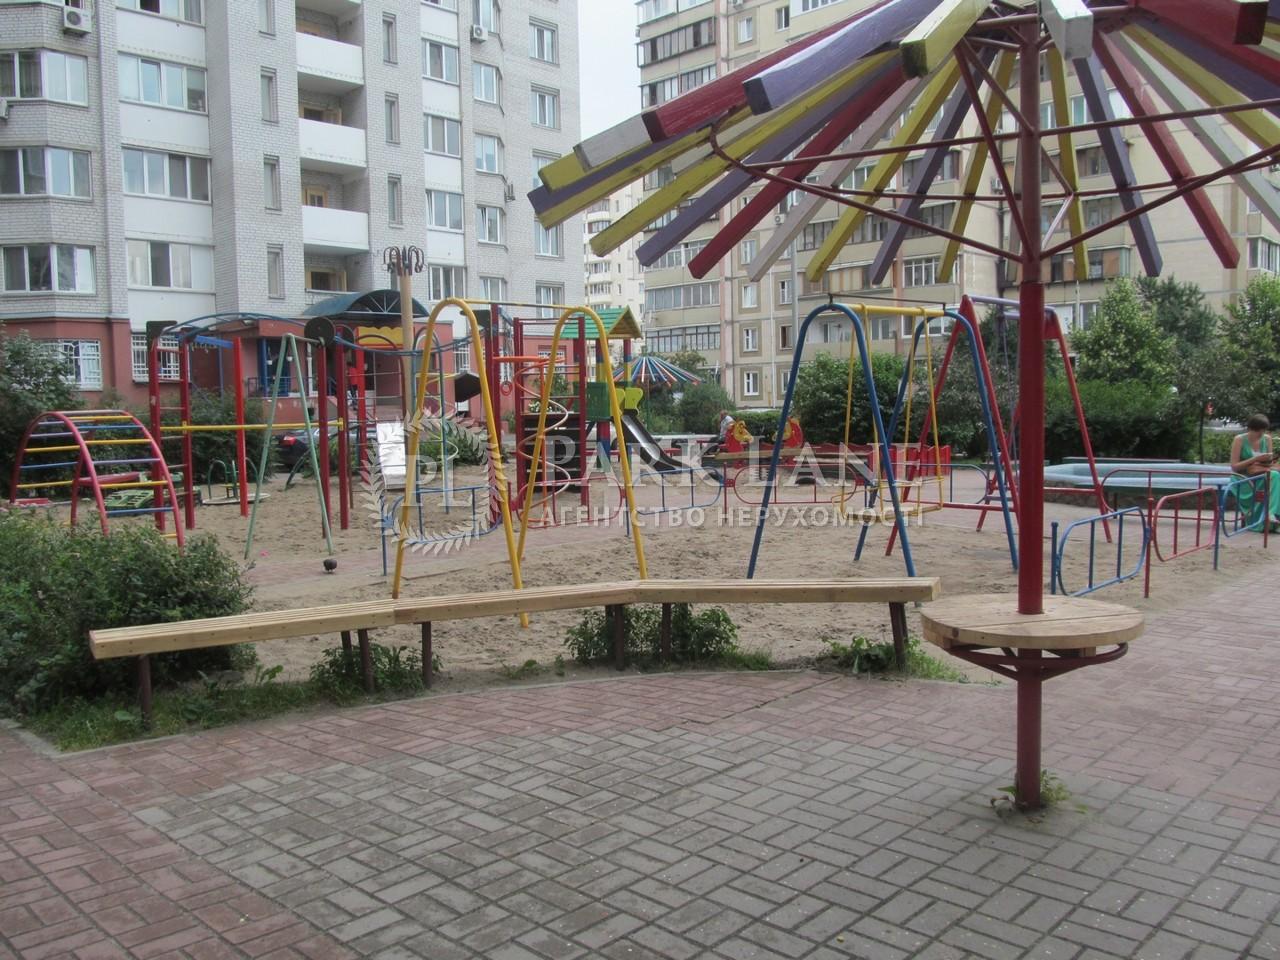 Квартира ул. Прилужная, 4/15, Киев, B-101455 - Фото 4